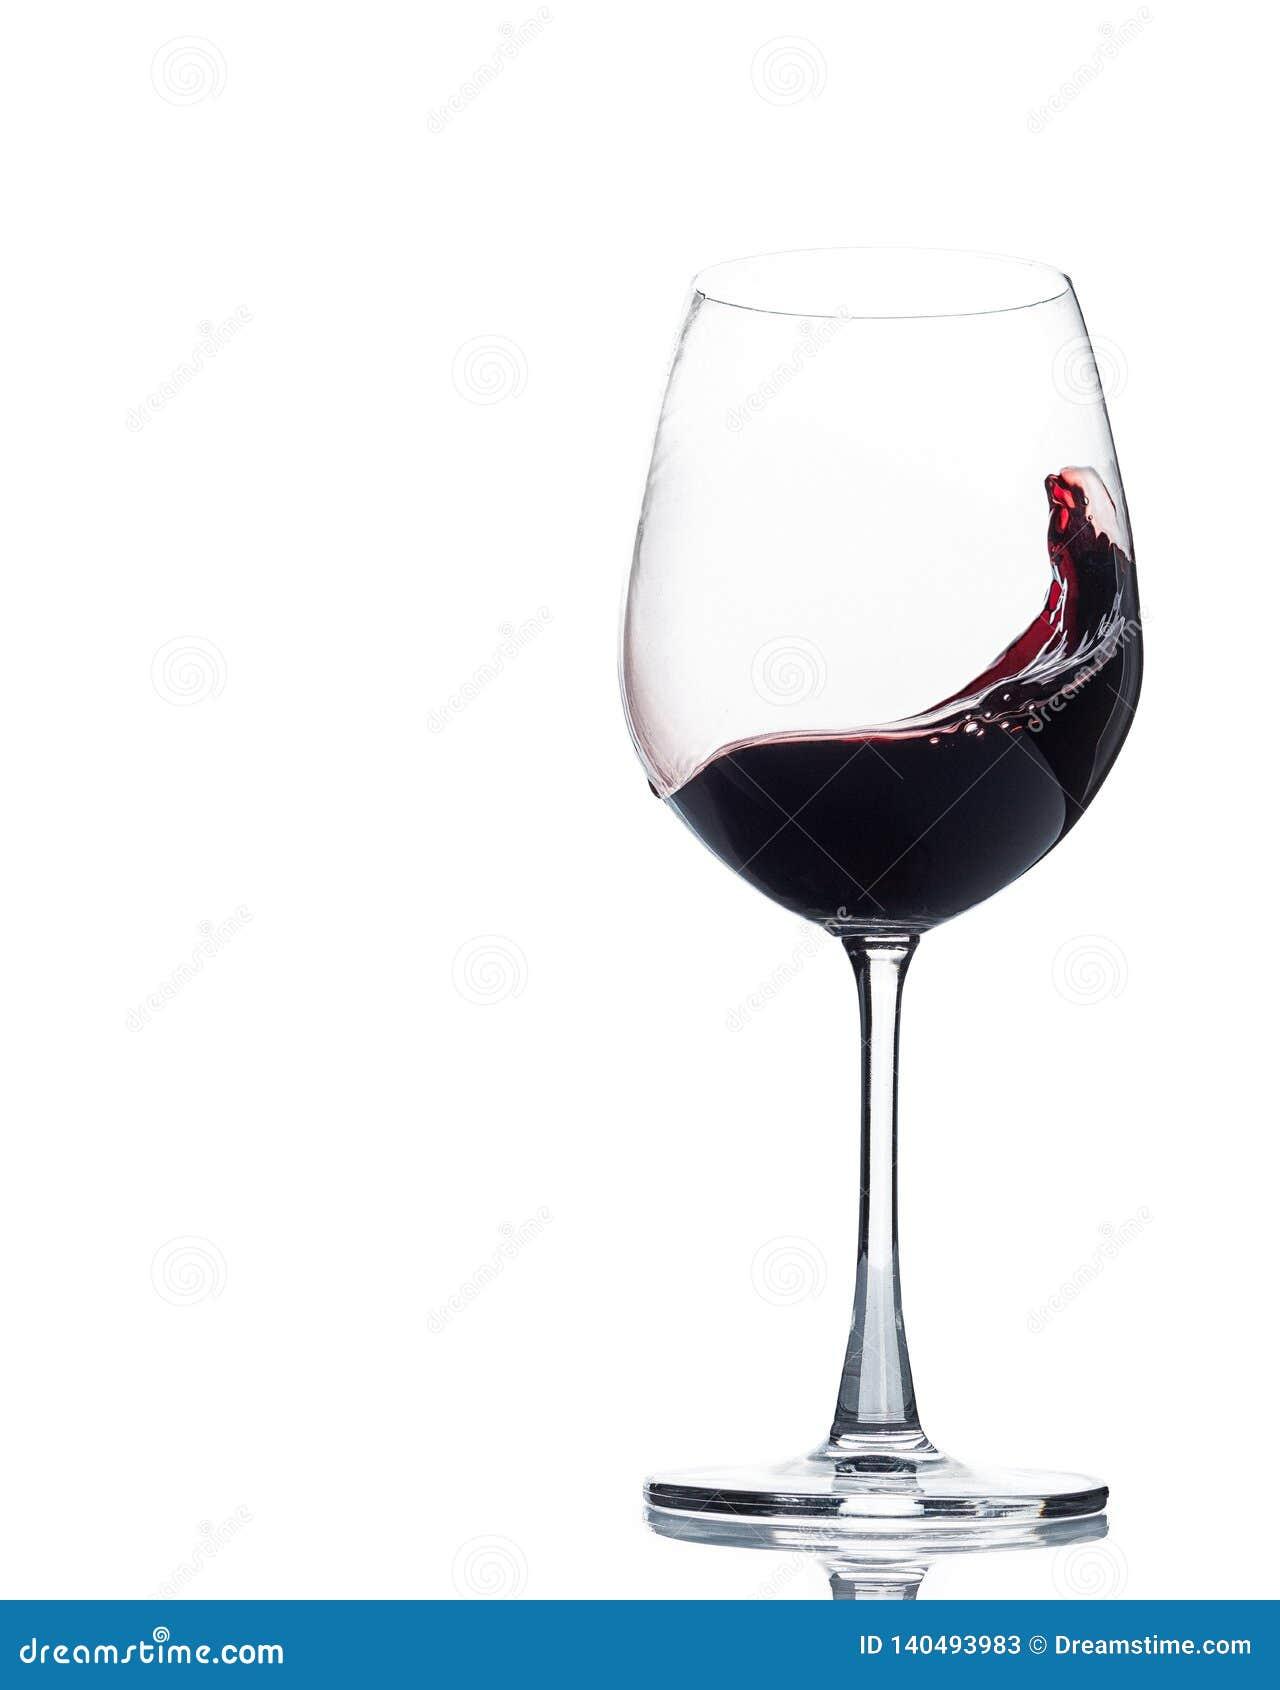 Wine Swirling in the Glass